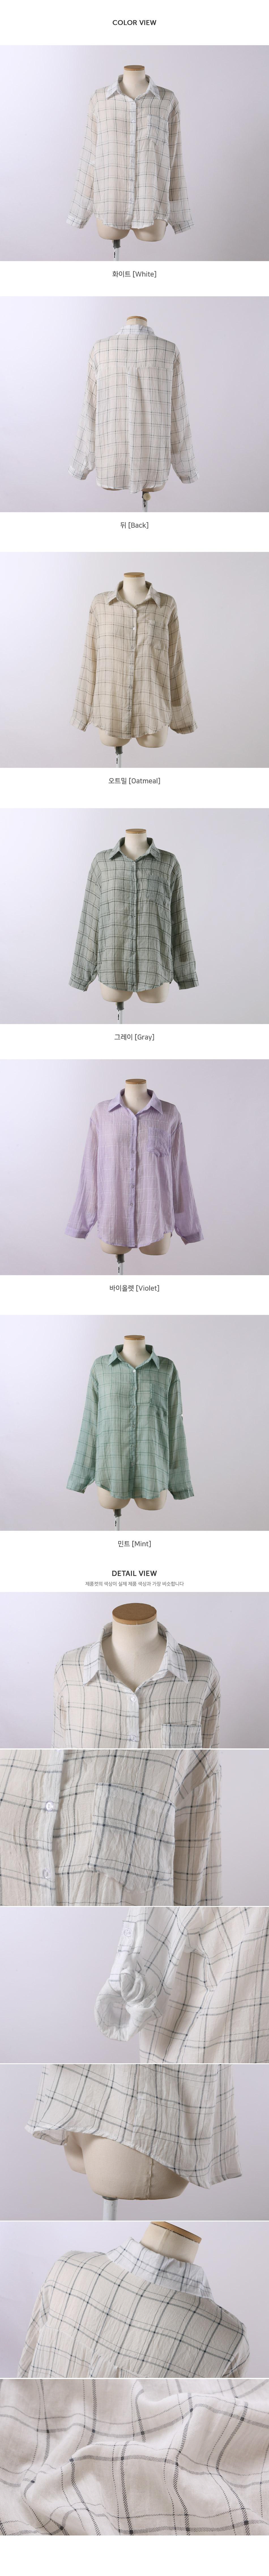 Minnet Check Pastel Shirt shirt